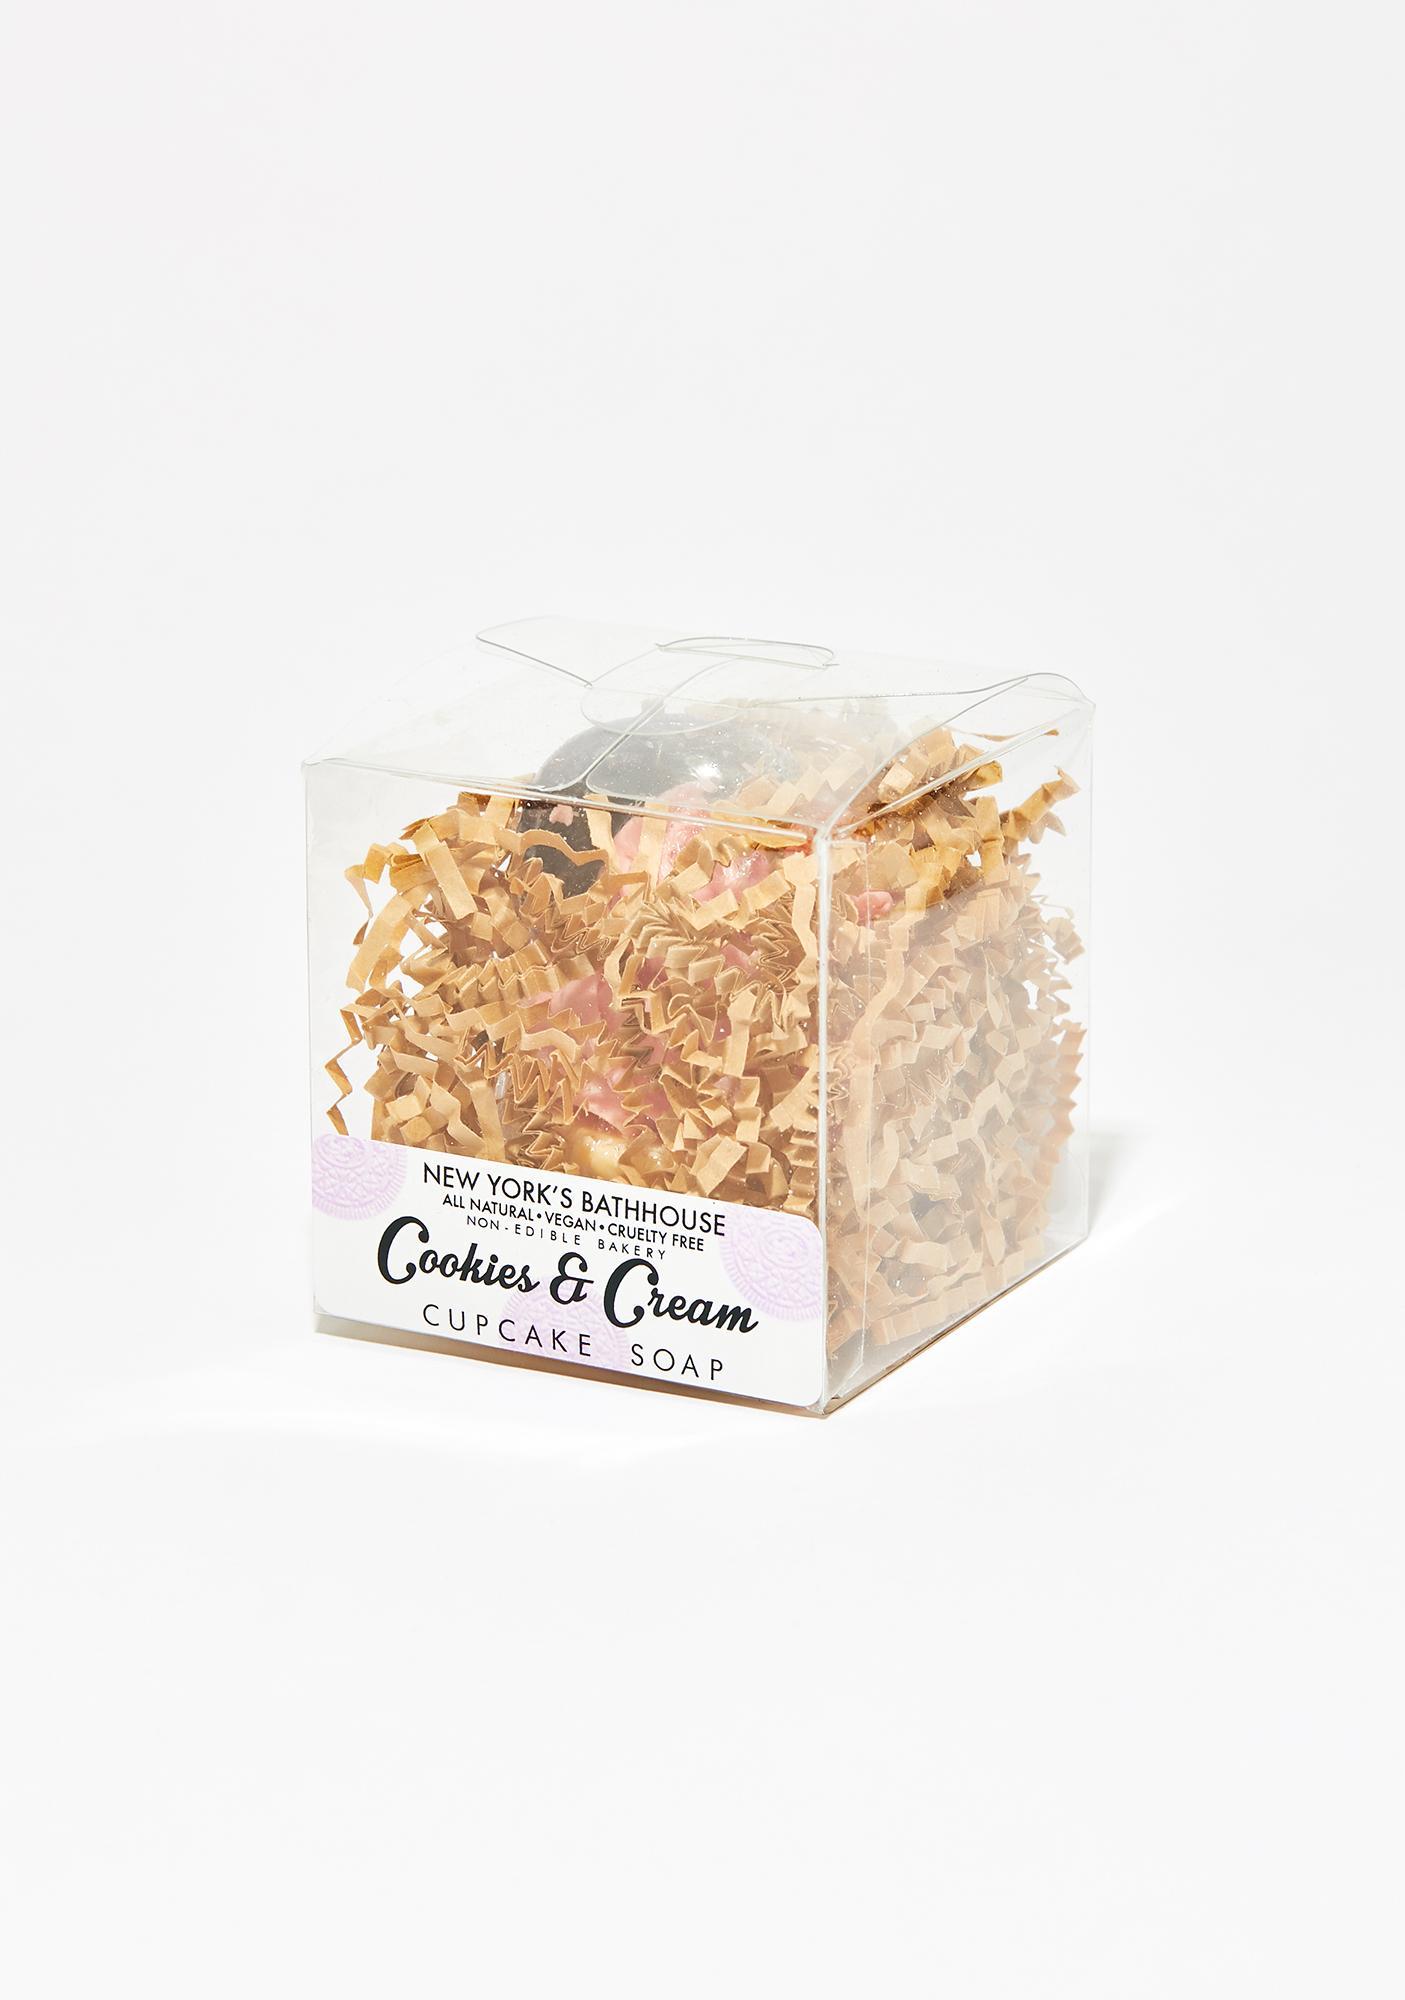 New York's Bathhouse  Cookies and Cream Cupcake Soap